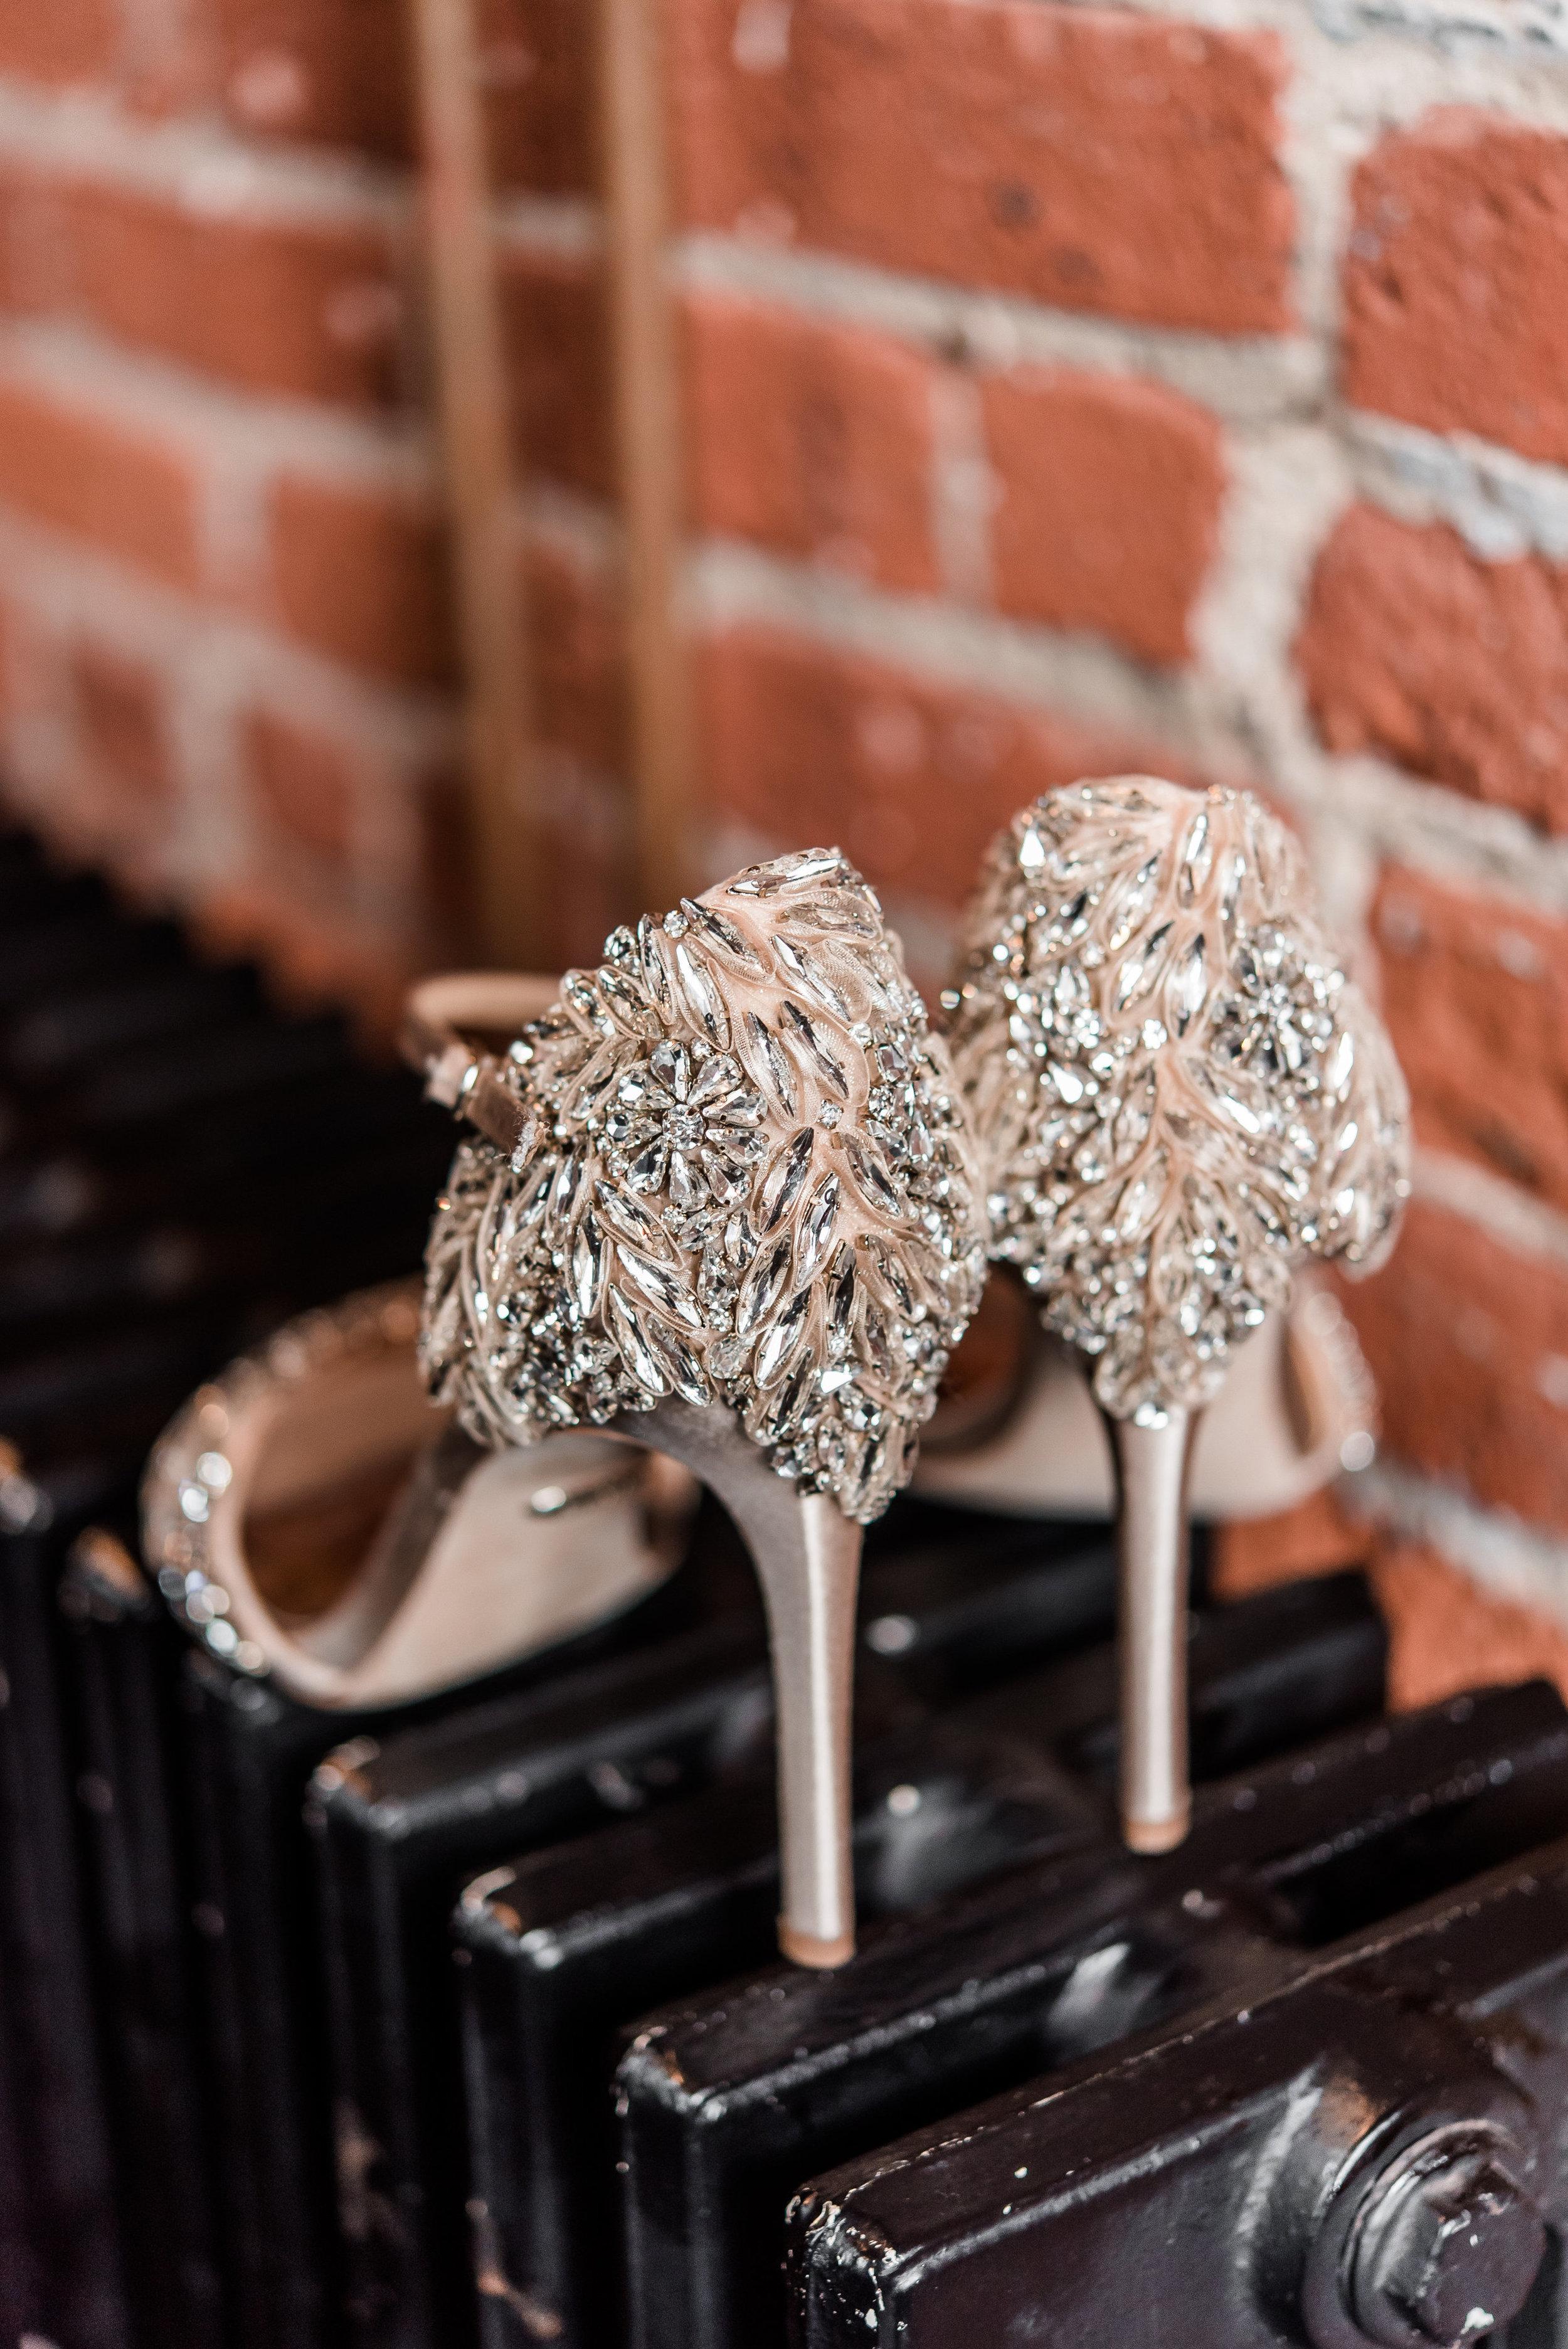 lancaster-wedding-photographer-corkfactory-hotel-industrial-glam-exposedbrick-hayleypaige0212.jpg